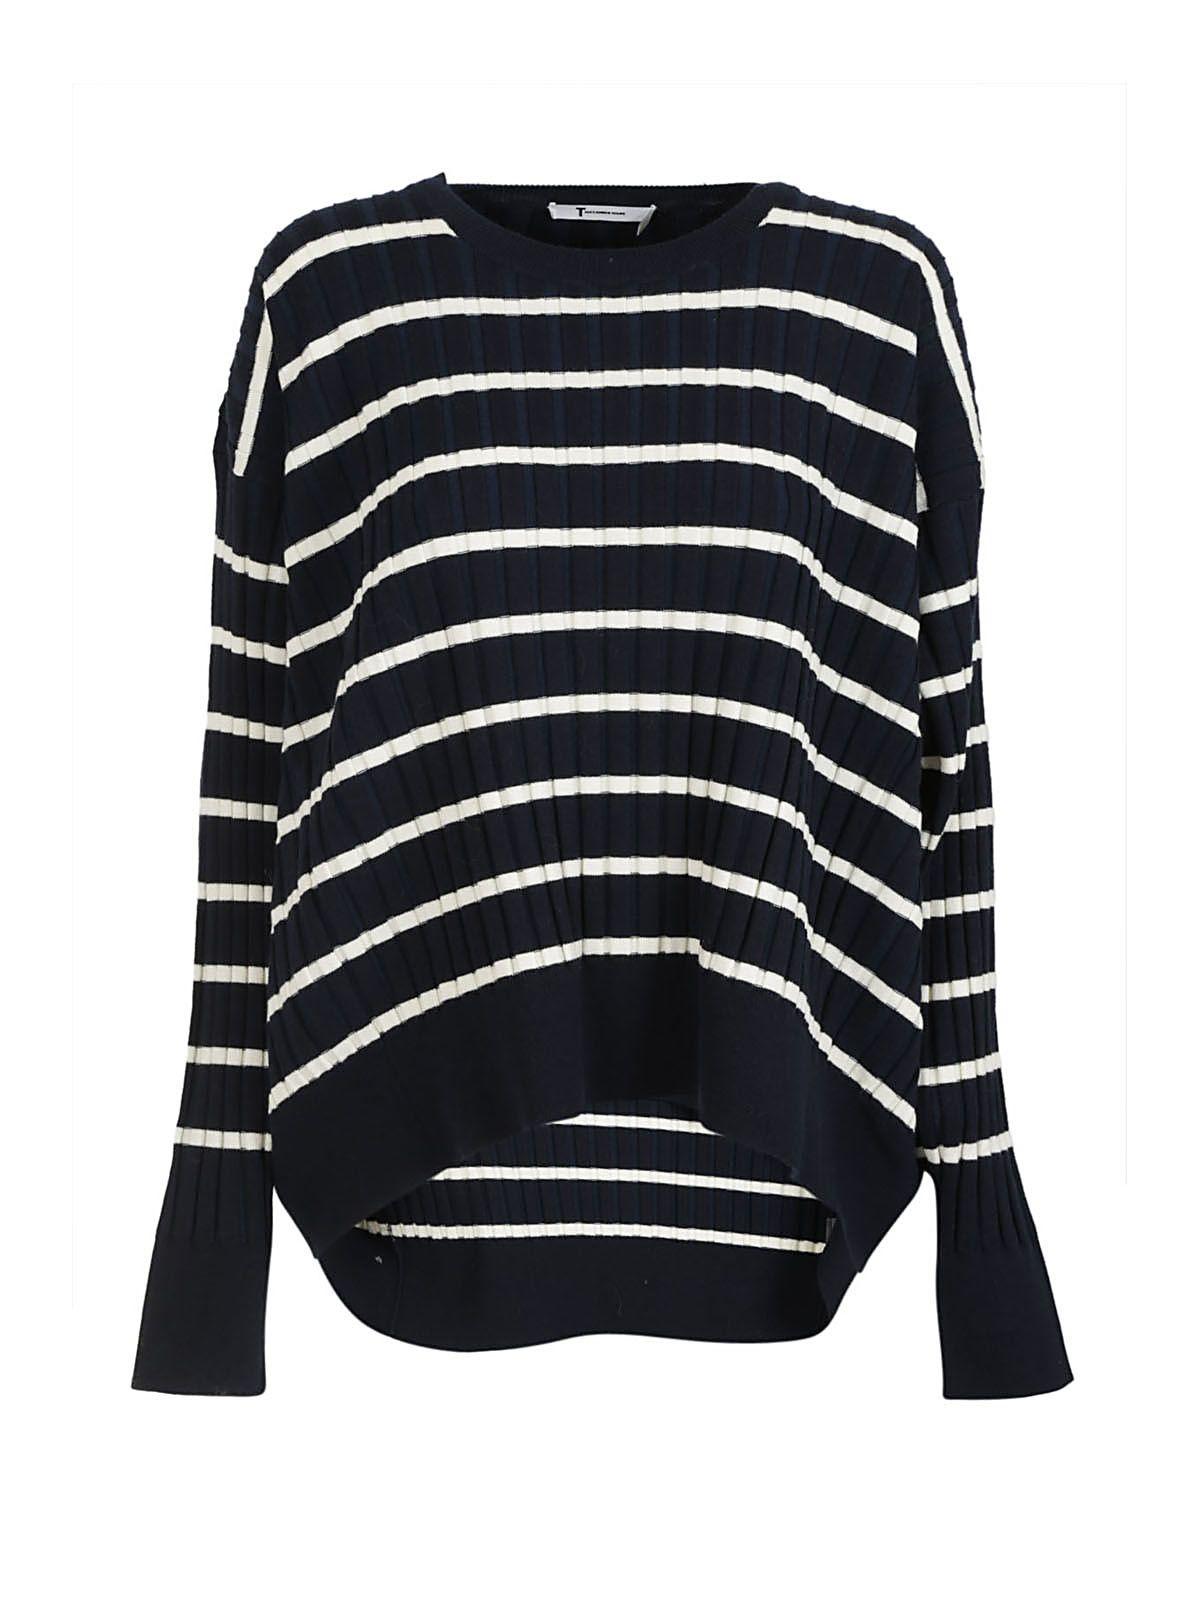 Alexander Wang Striped Sweater